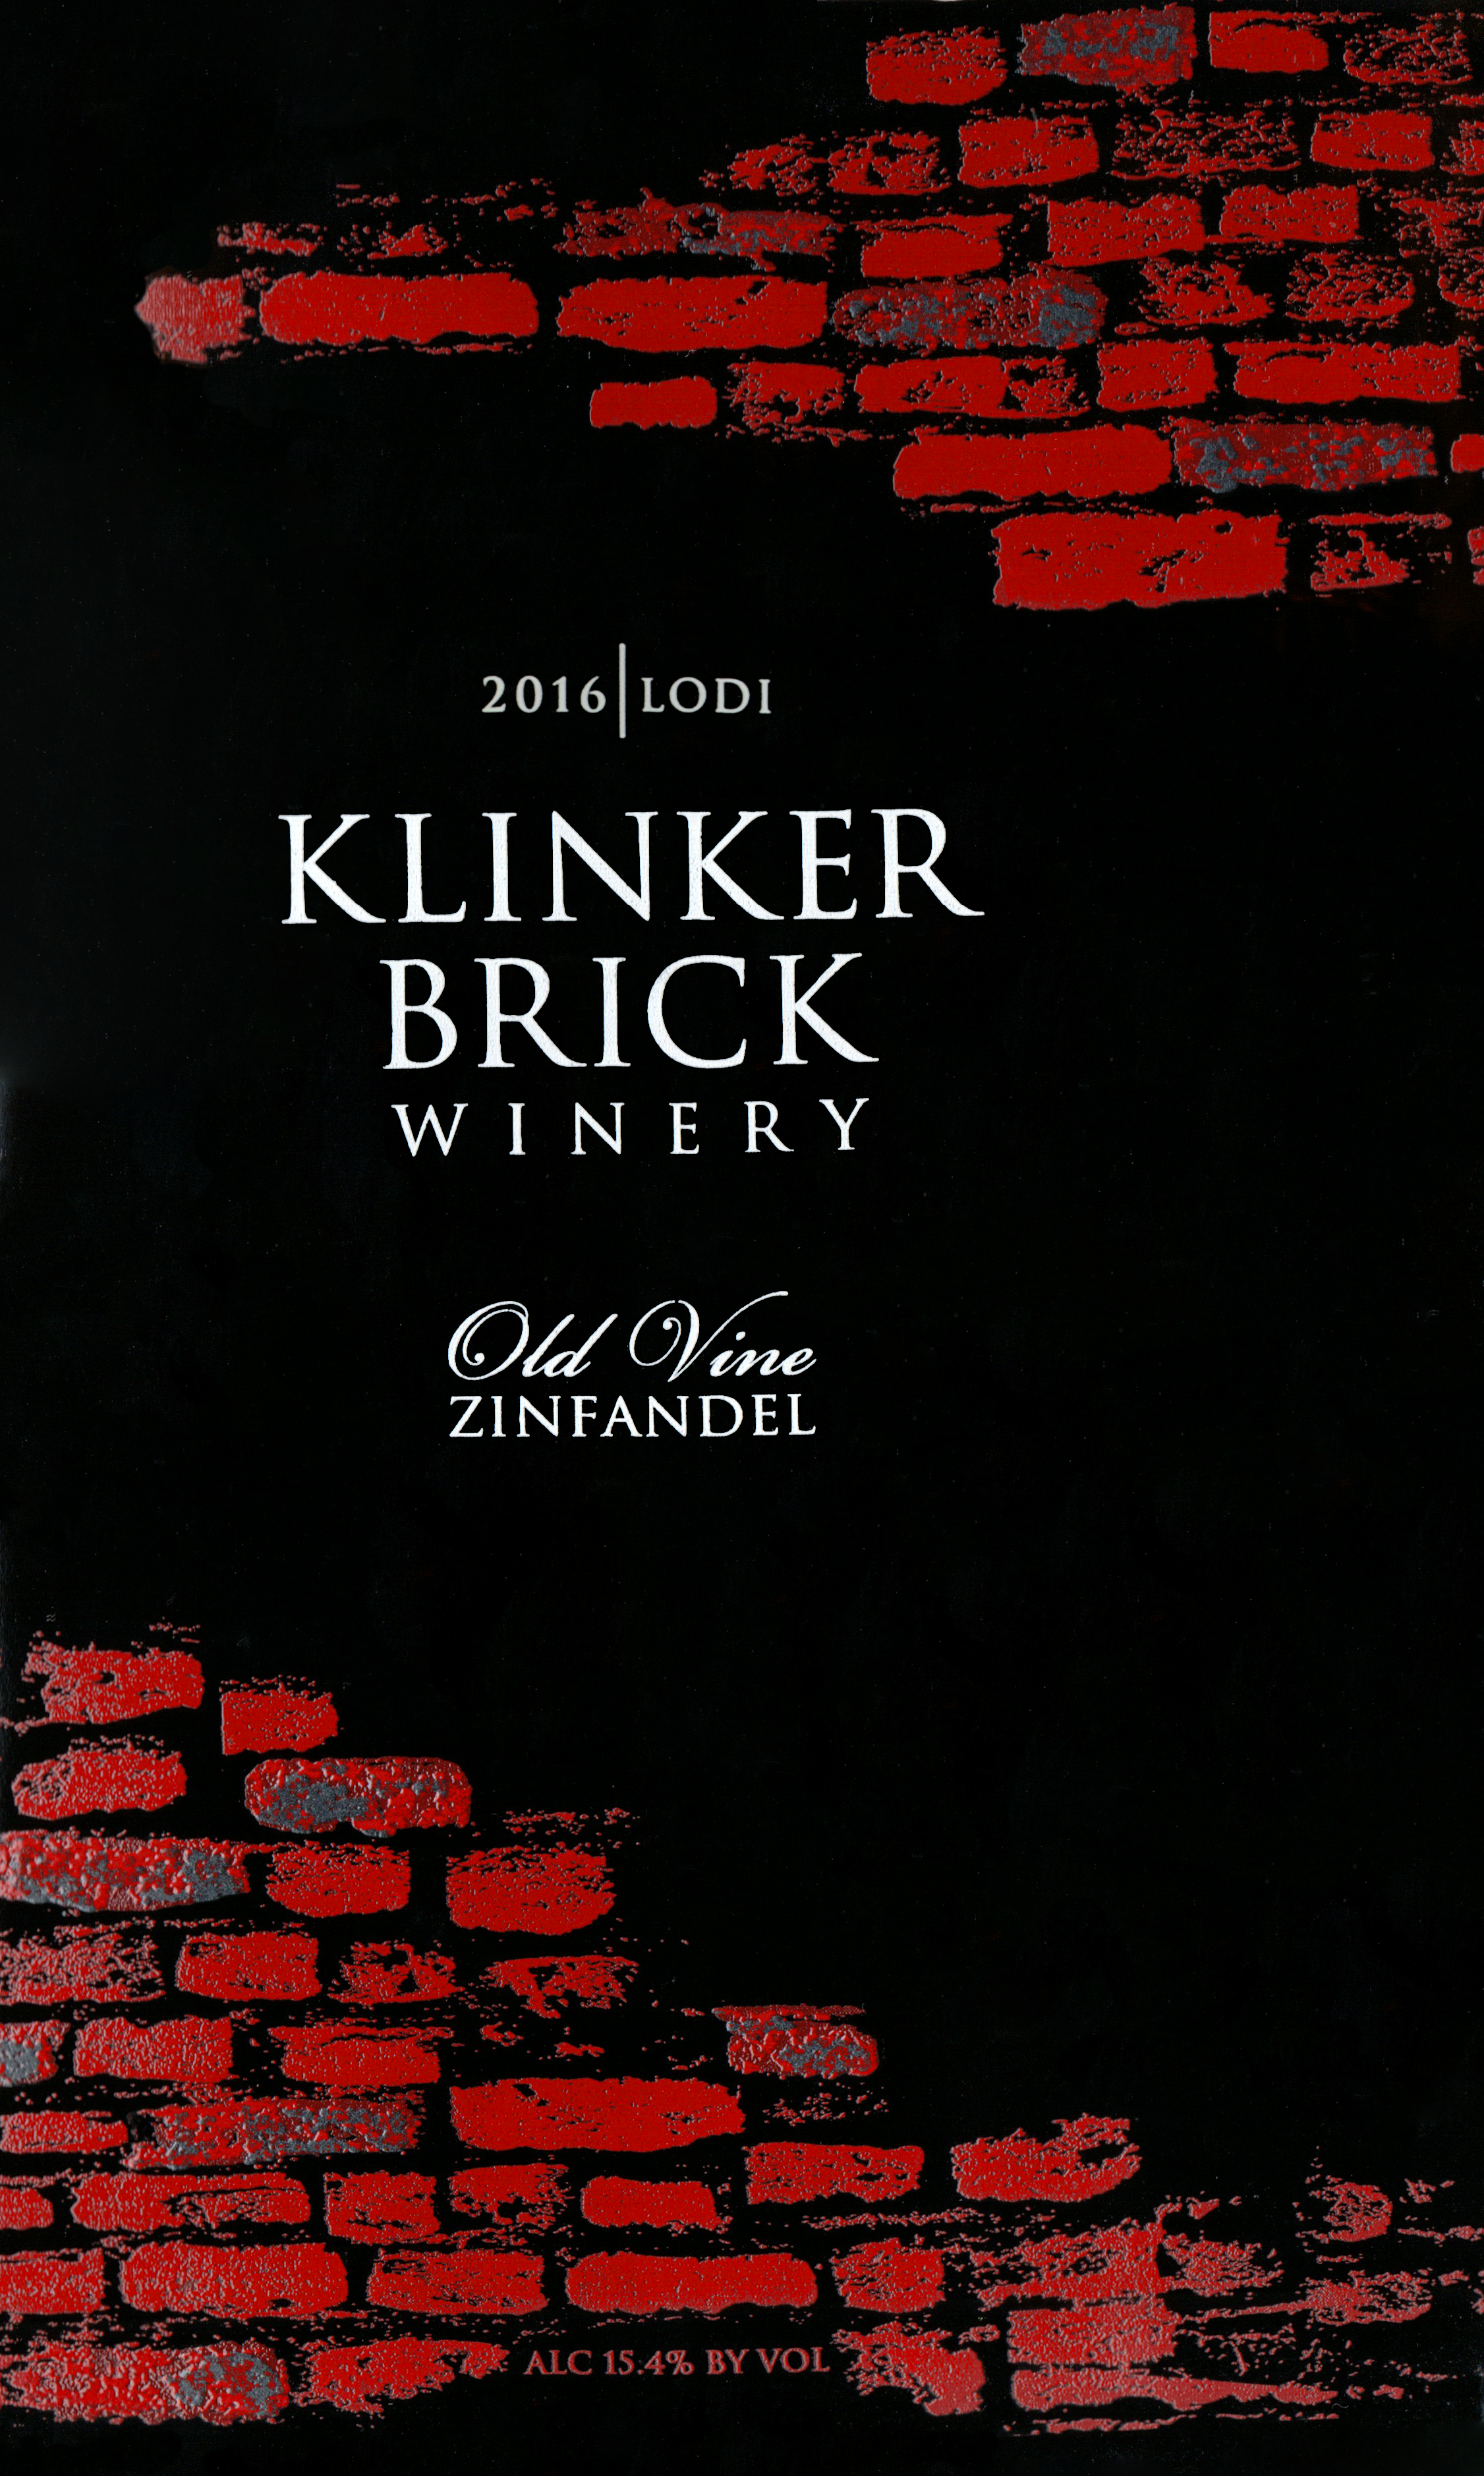 Klinker Brick Lodi Old Vine Zinfandel 2016